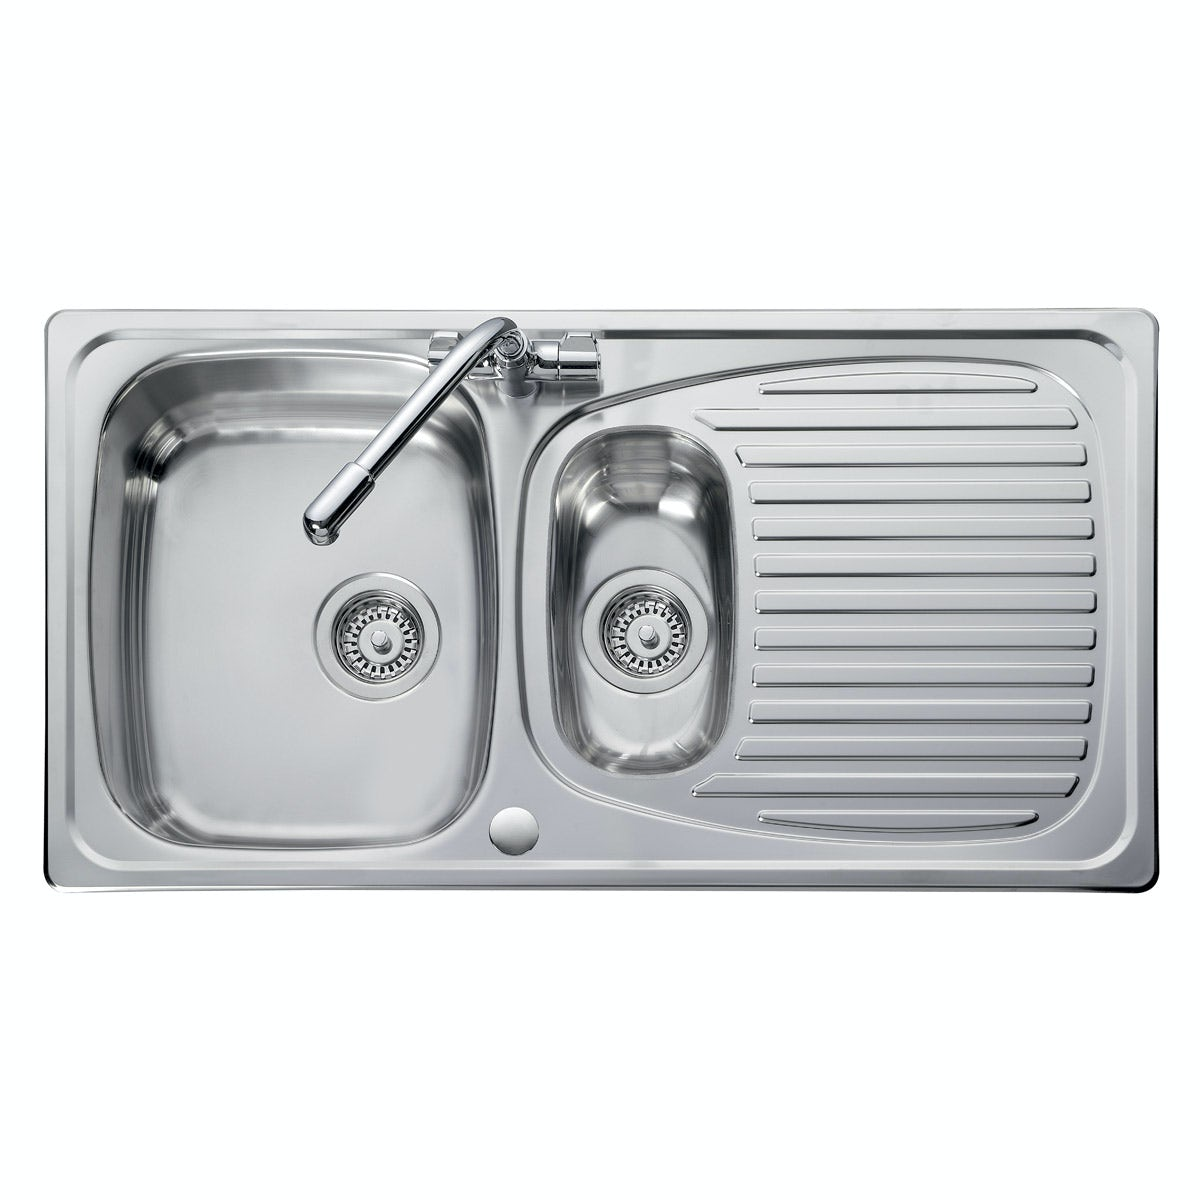 Leisure Euroline 1.5 bowl reversible kitchen sink